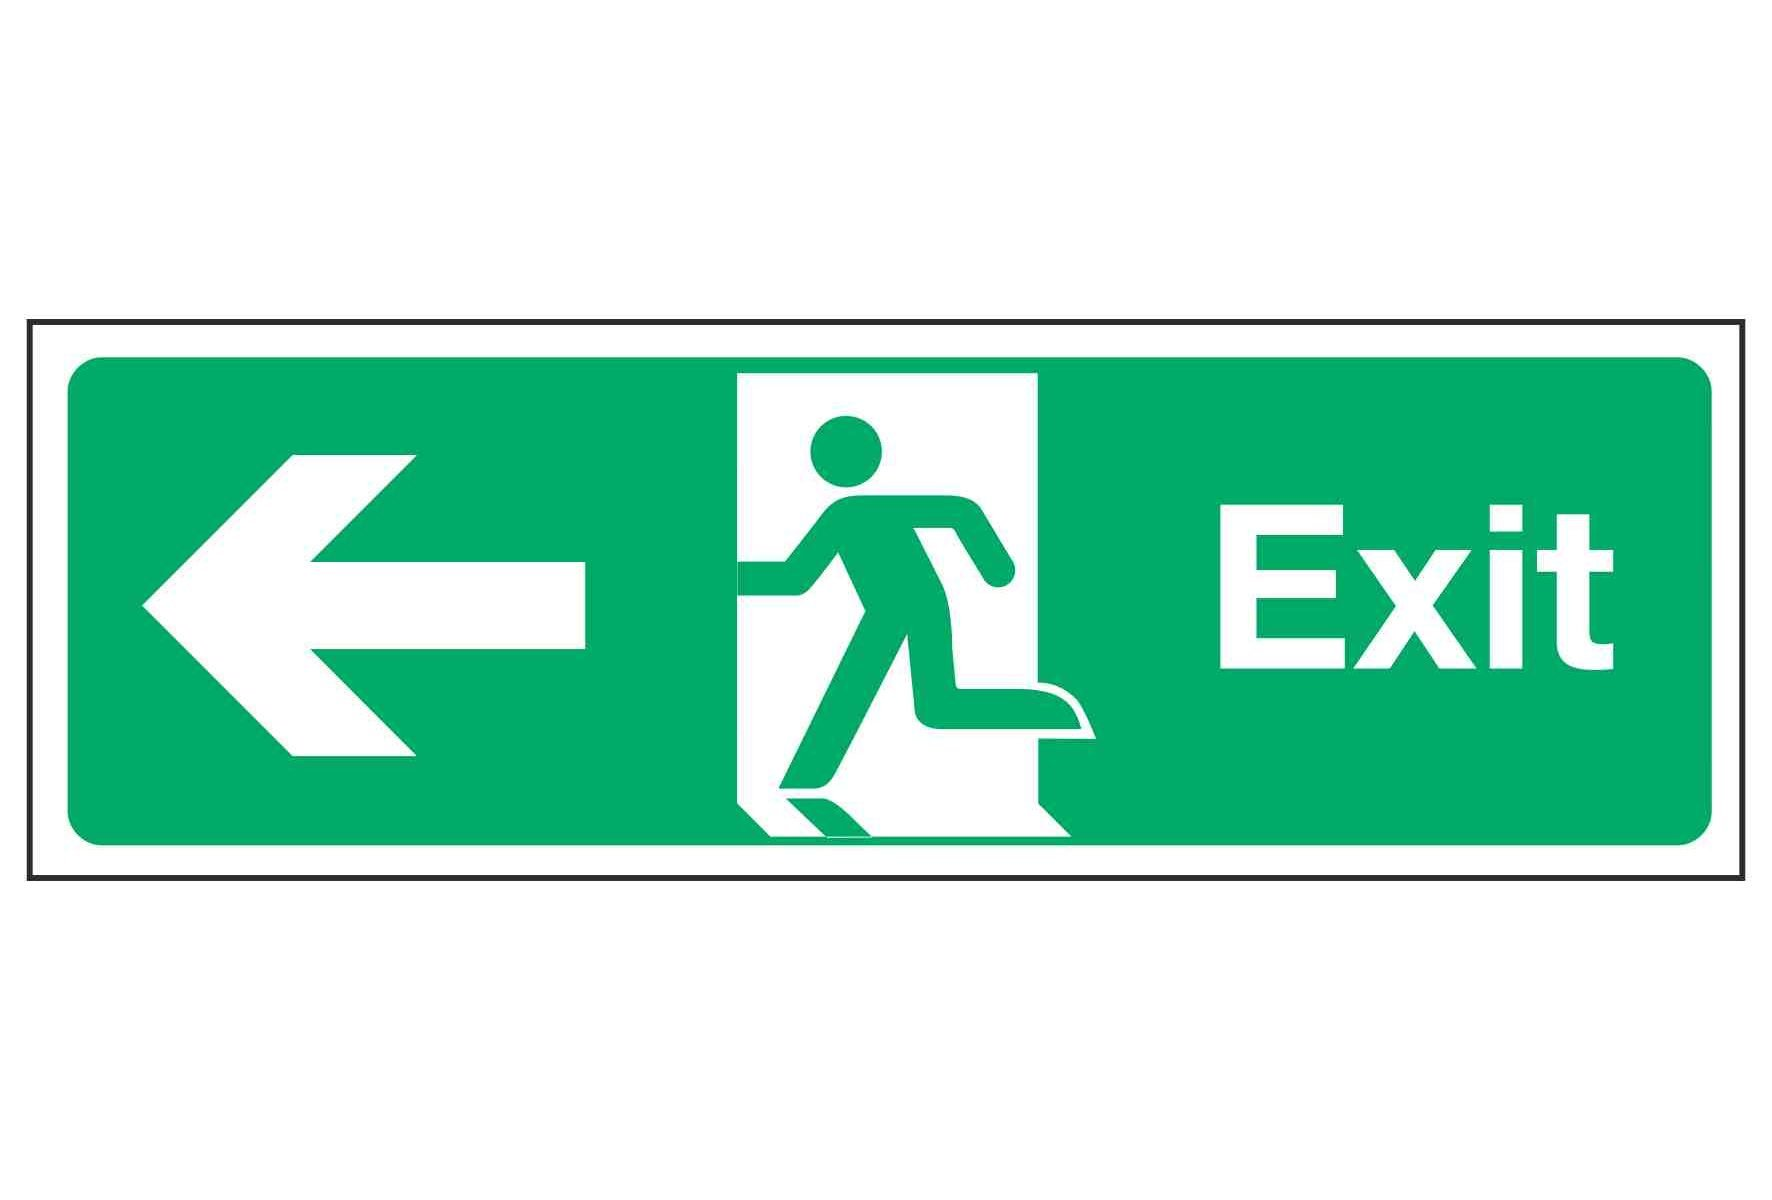 Exit / Arrow Left